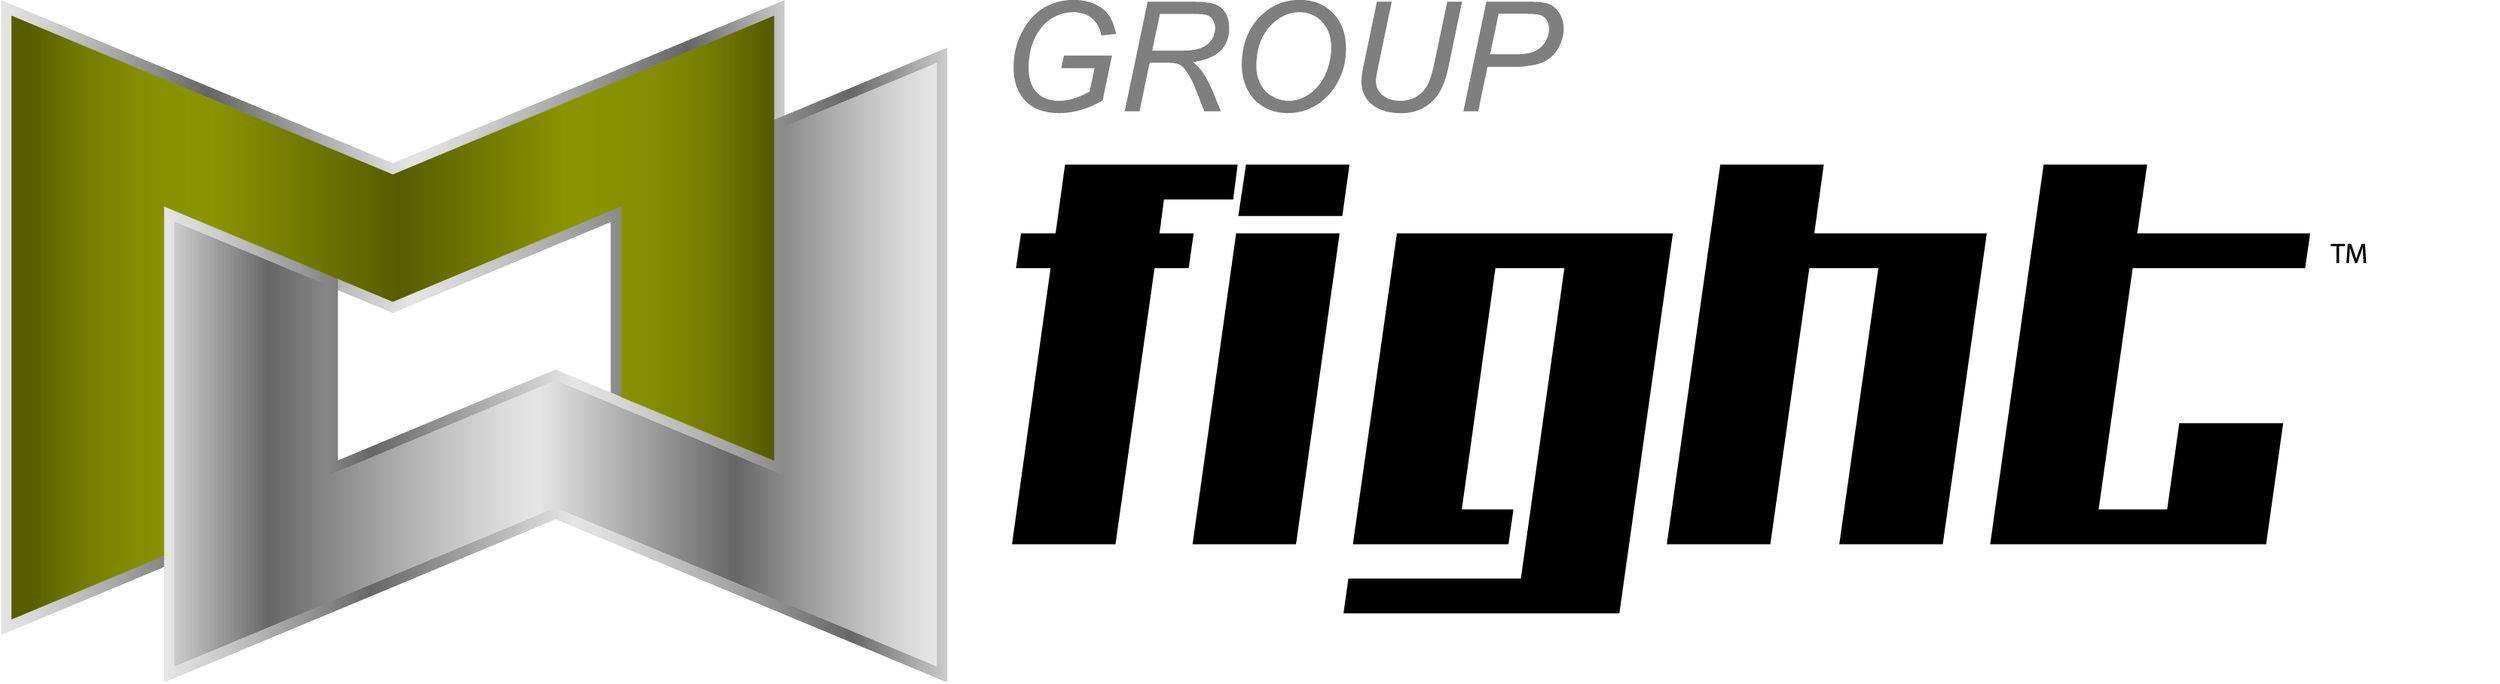 GP-MOSSA-FullLogo-RGB-hires.jpg